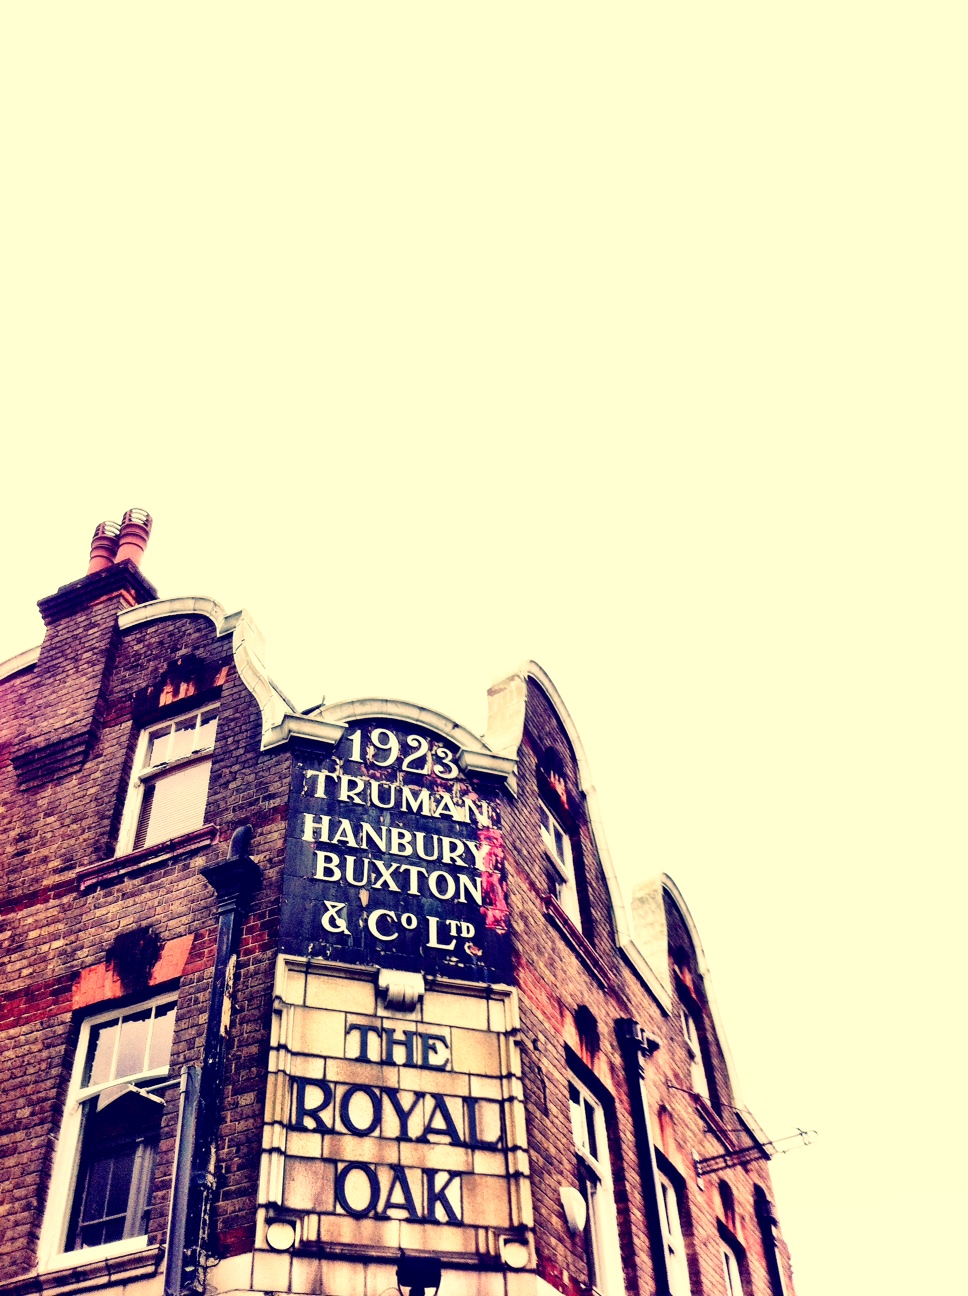 1923 truman hanbury buxton the royal oak columbia road flower market